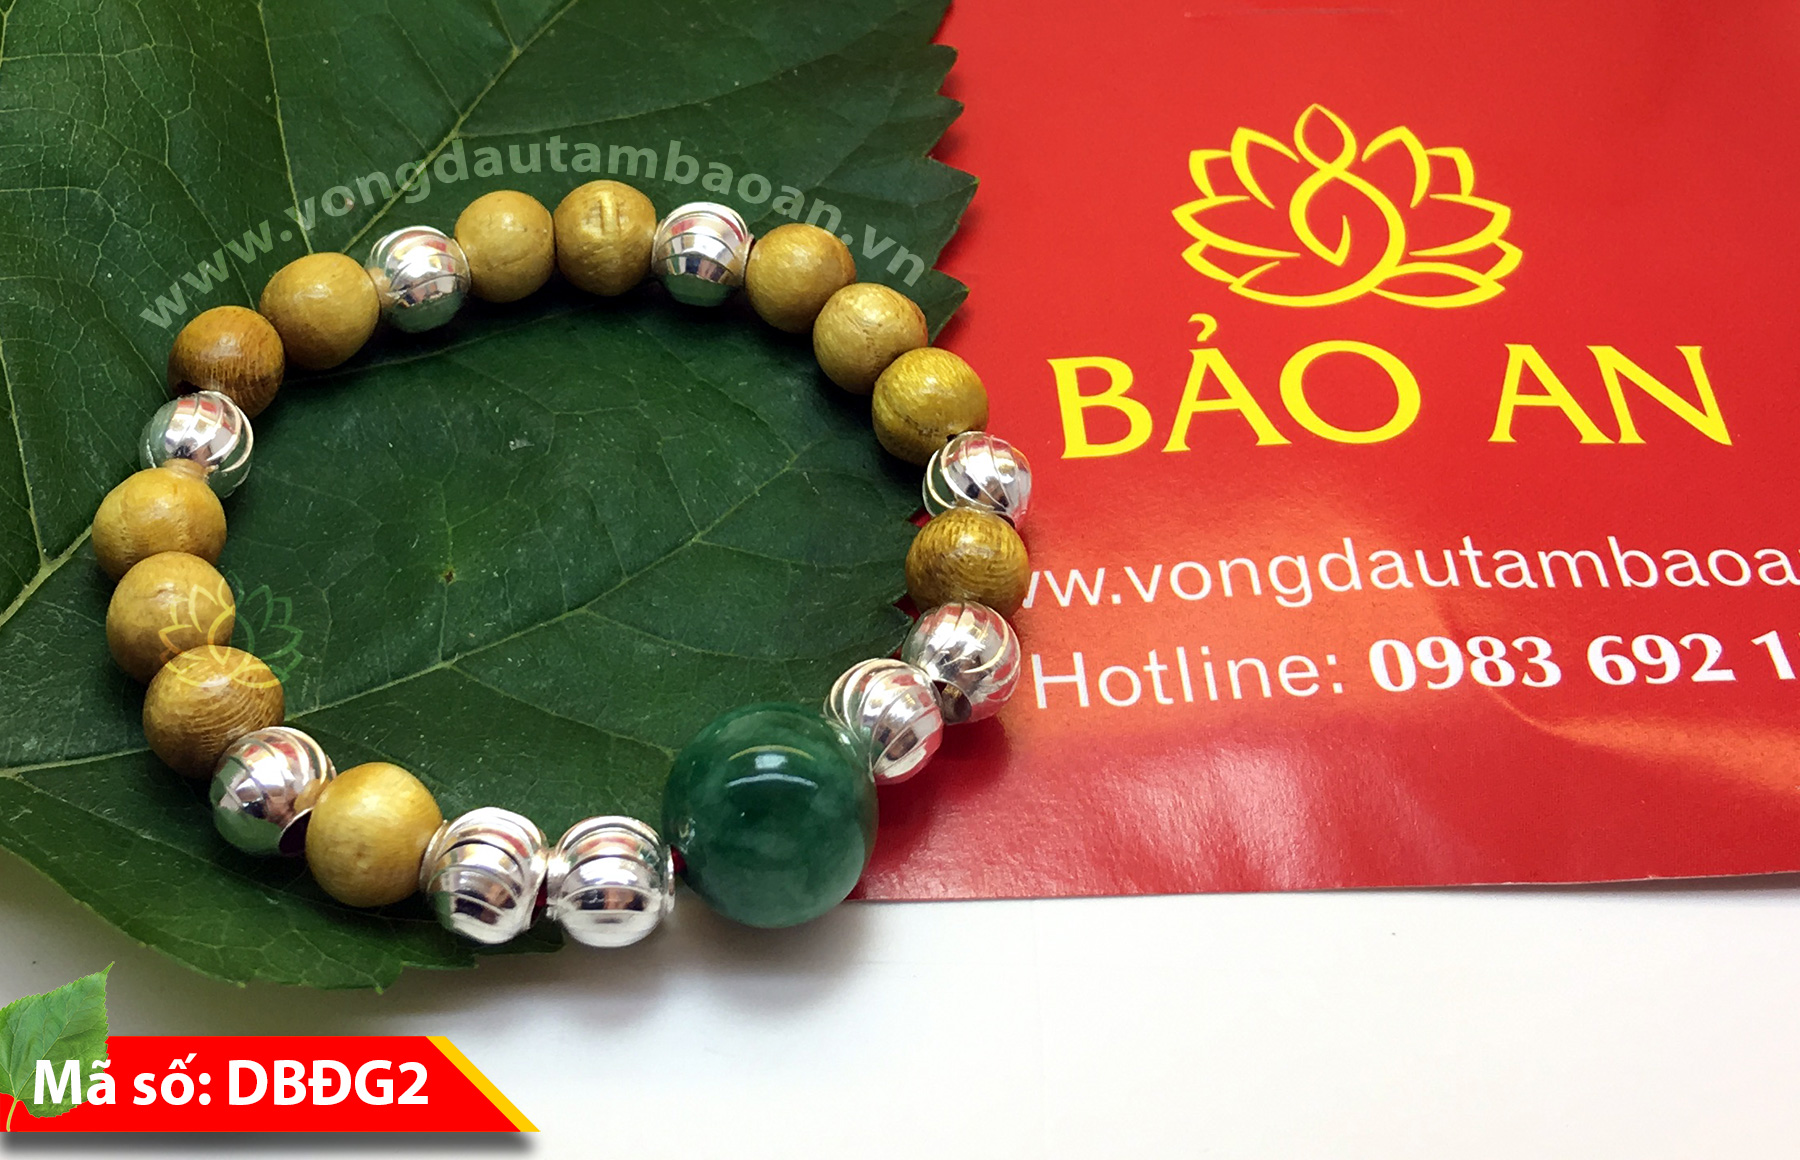 Vong-dau-tam-DBDG2-A